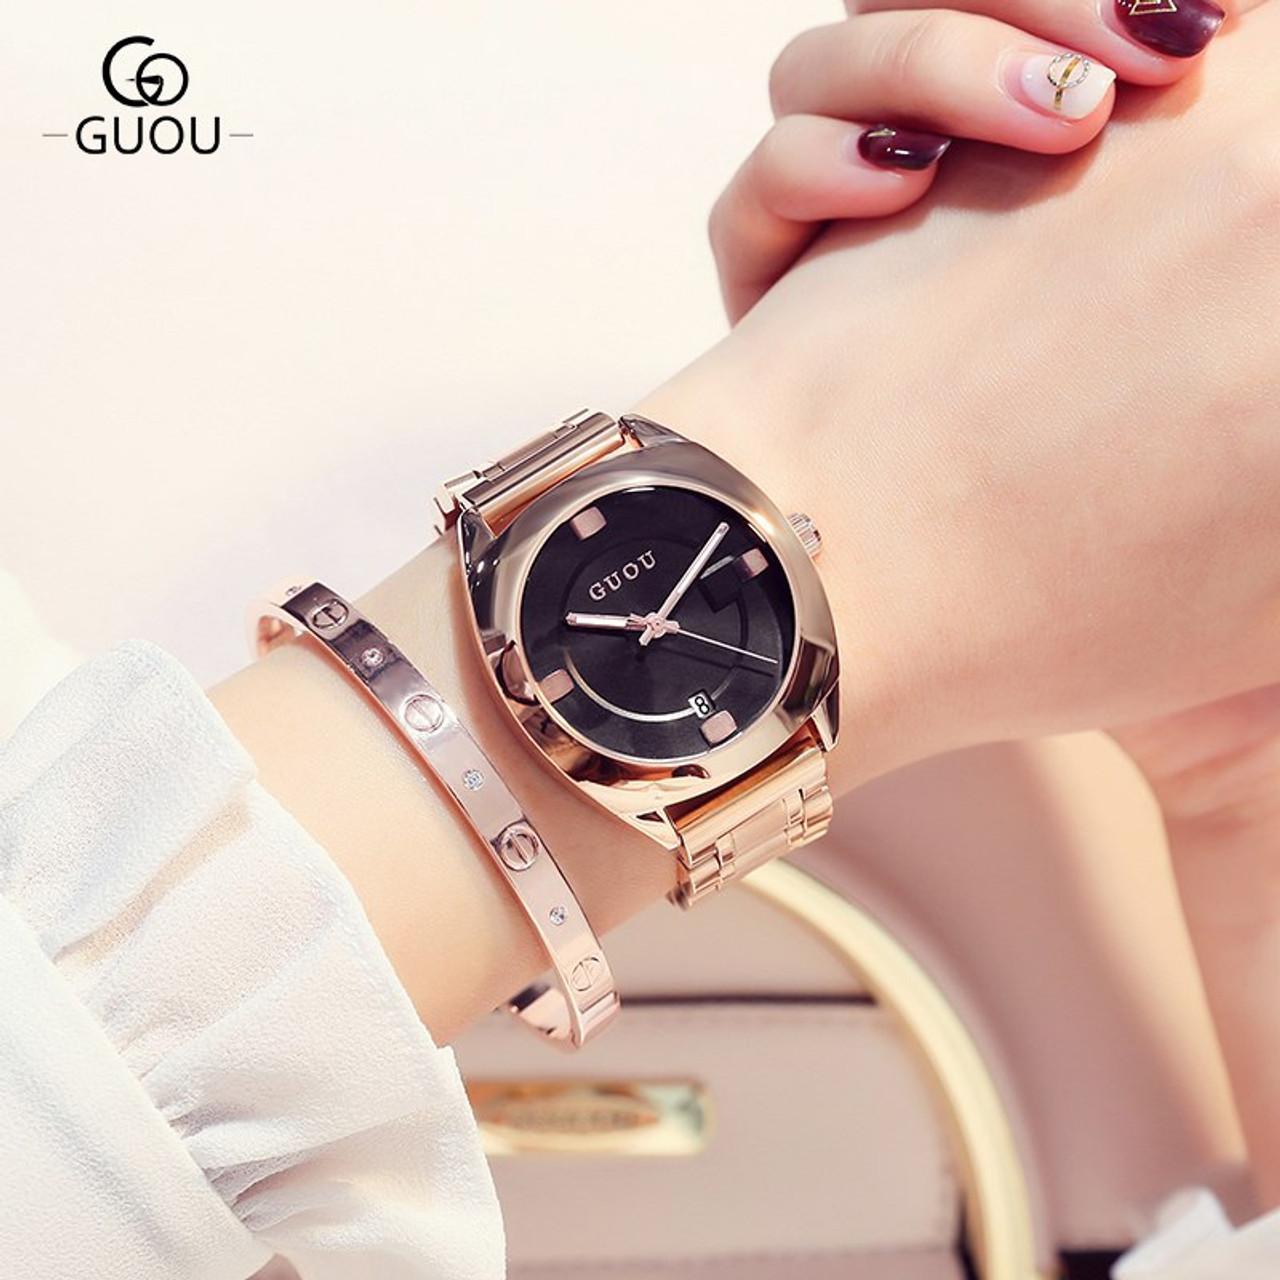 d349d2a38d2a ... GUOU Watch Women Top Luxury Steel Bracelet Auto Date Women Watches  Fashion Exquisite Ladies saat relogio ...